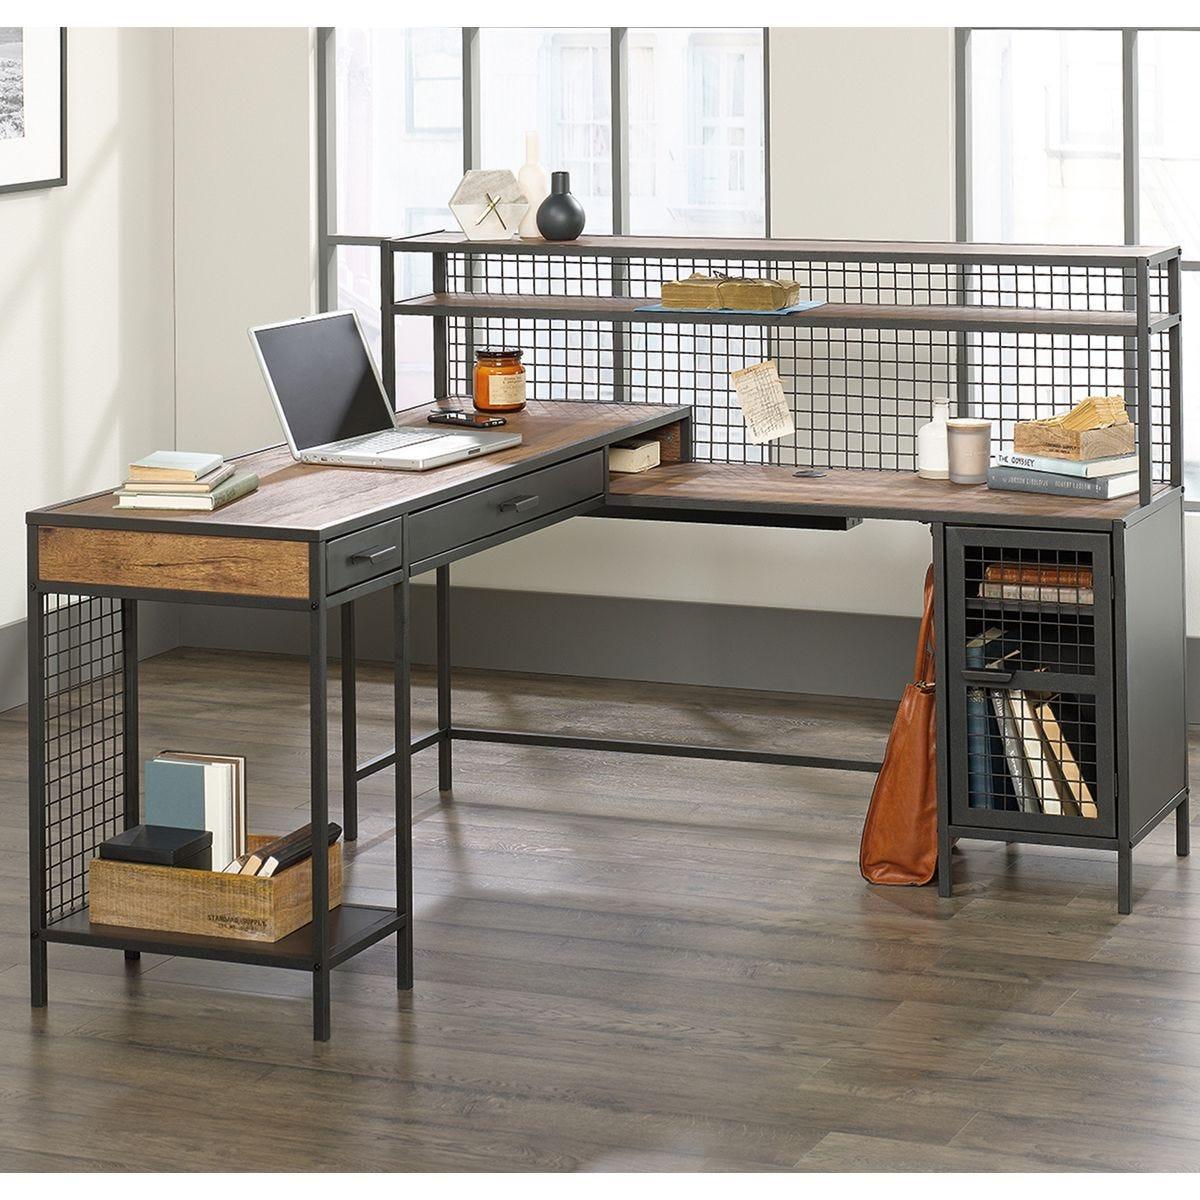 Teknik Boulevard Cafe L-Shaped Desk